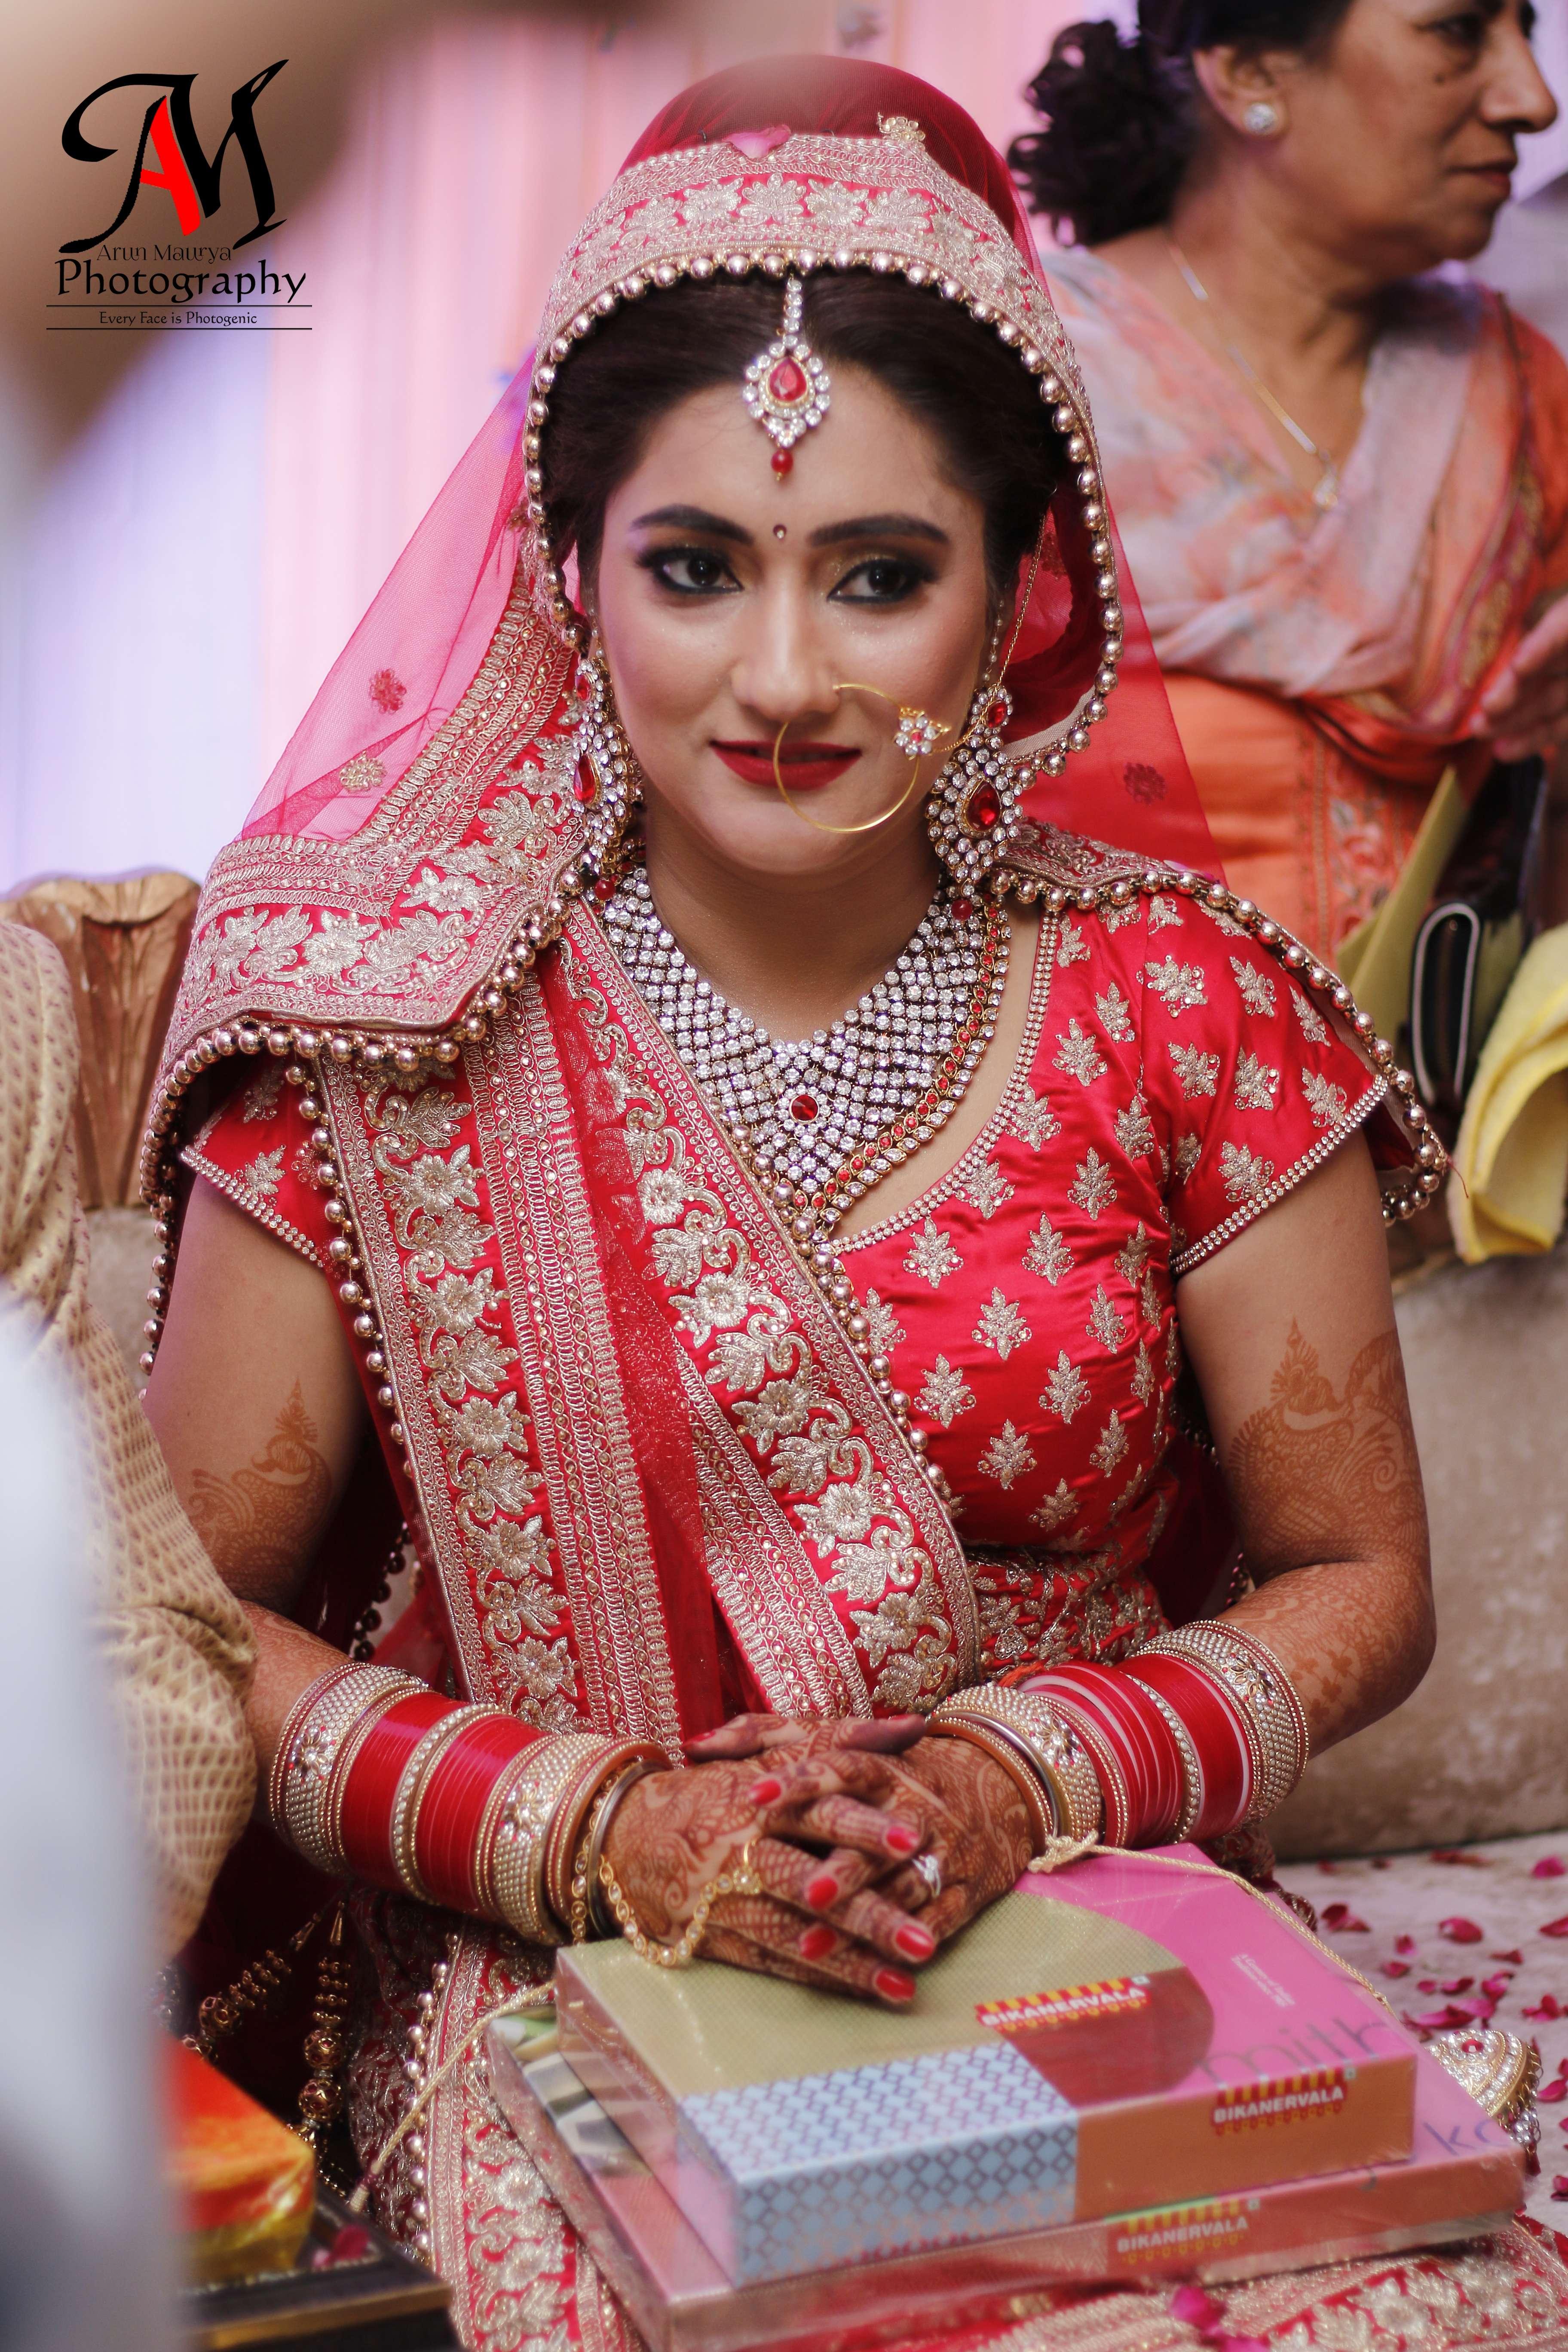 Arun Maurya Photography - Portfolio